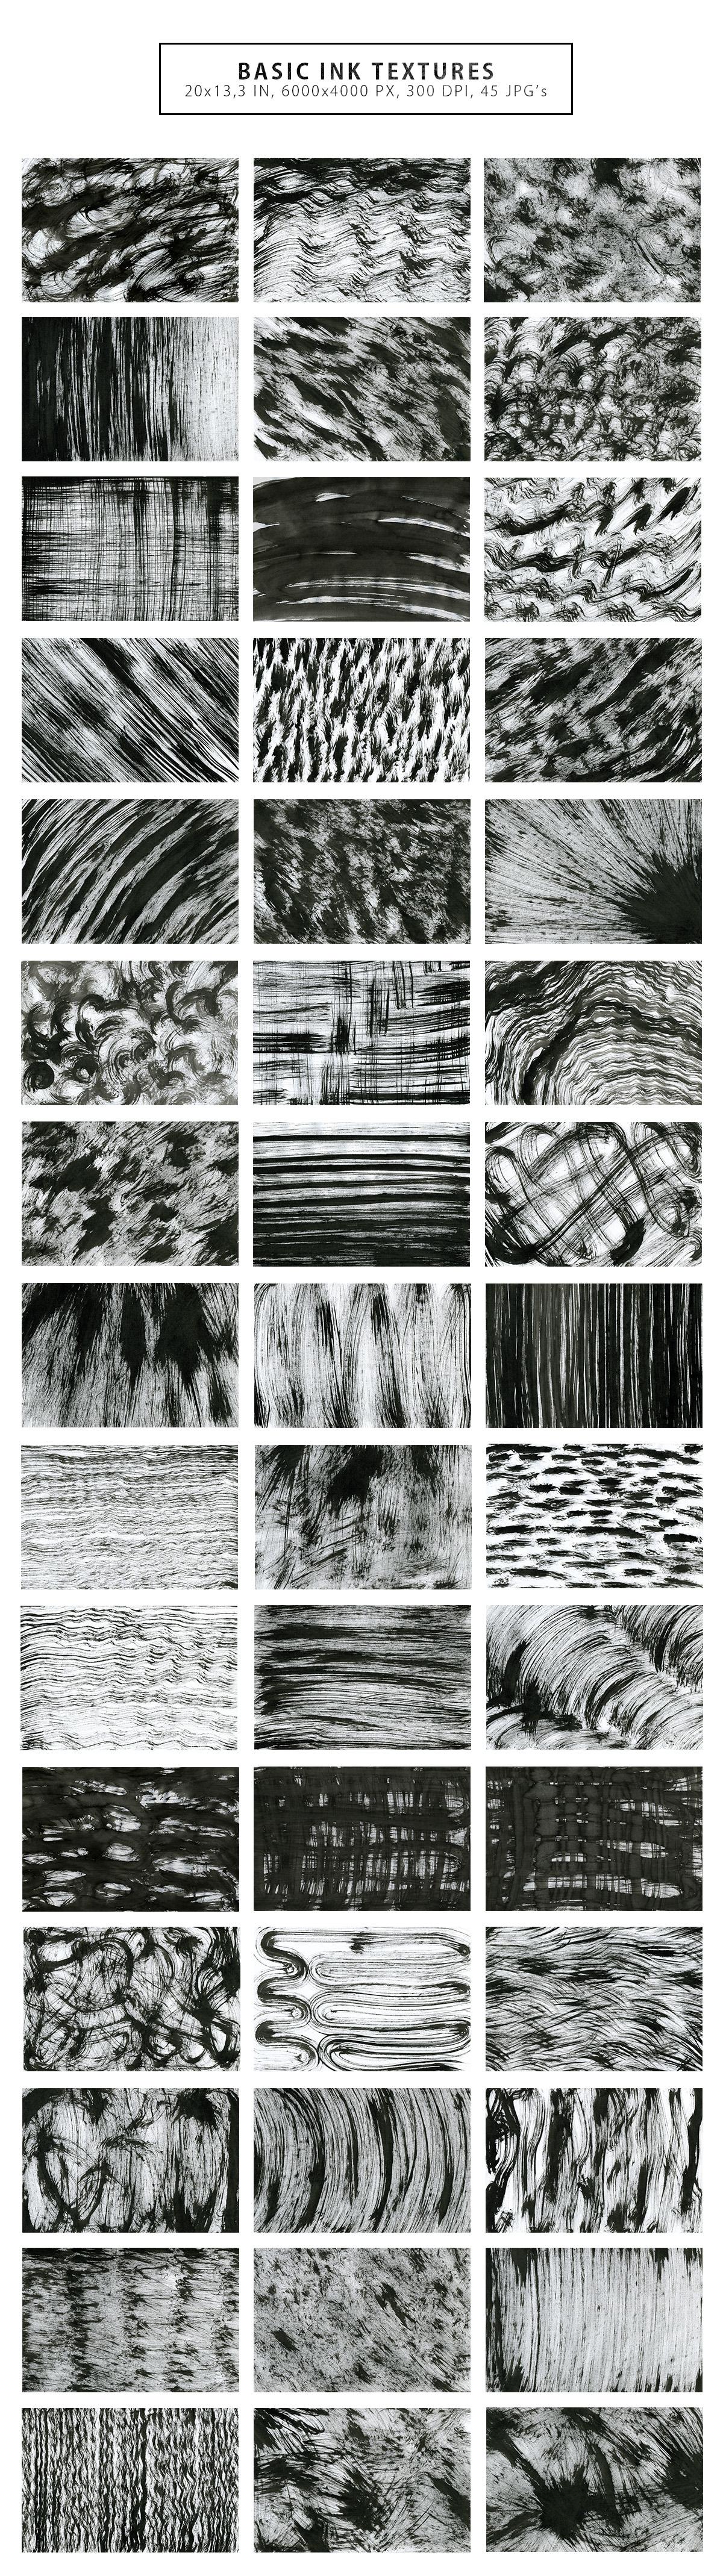 Inverted Black Ink Backgrounds Vol.2 example image 5